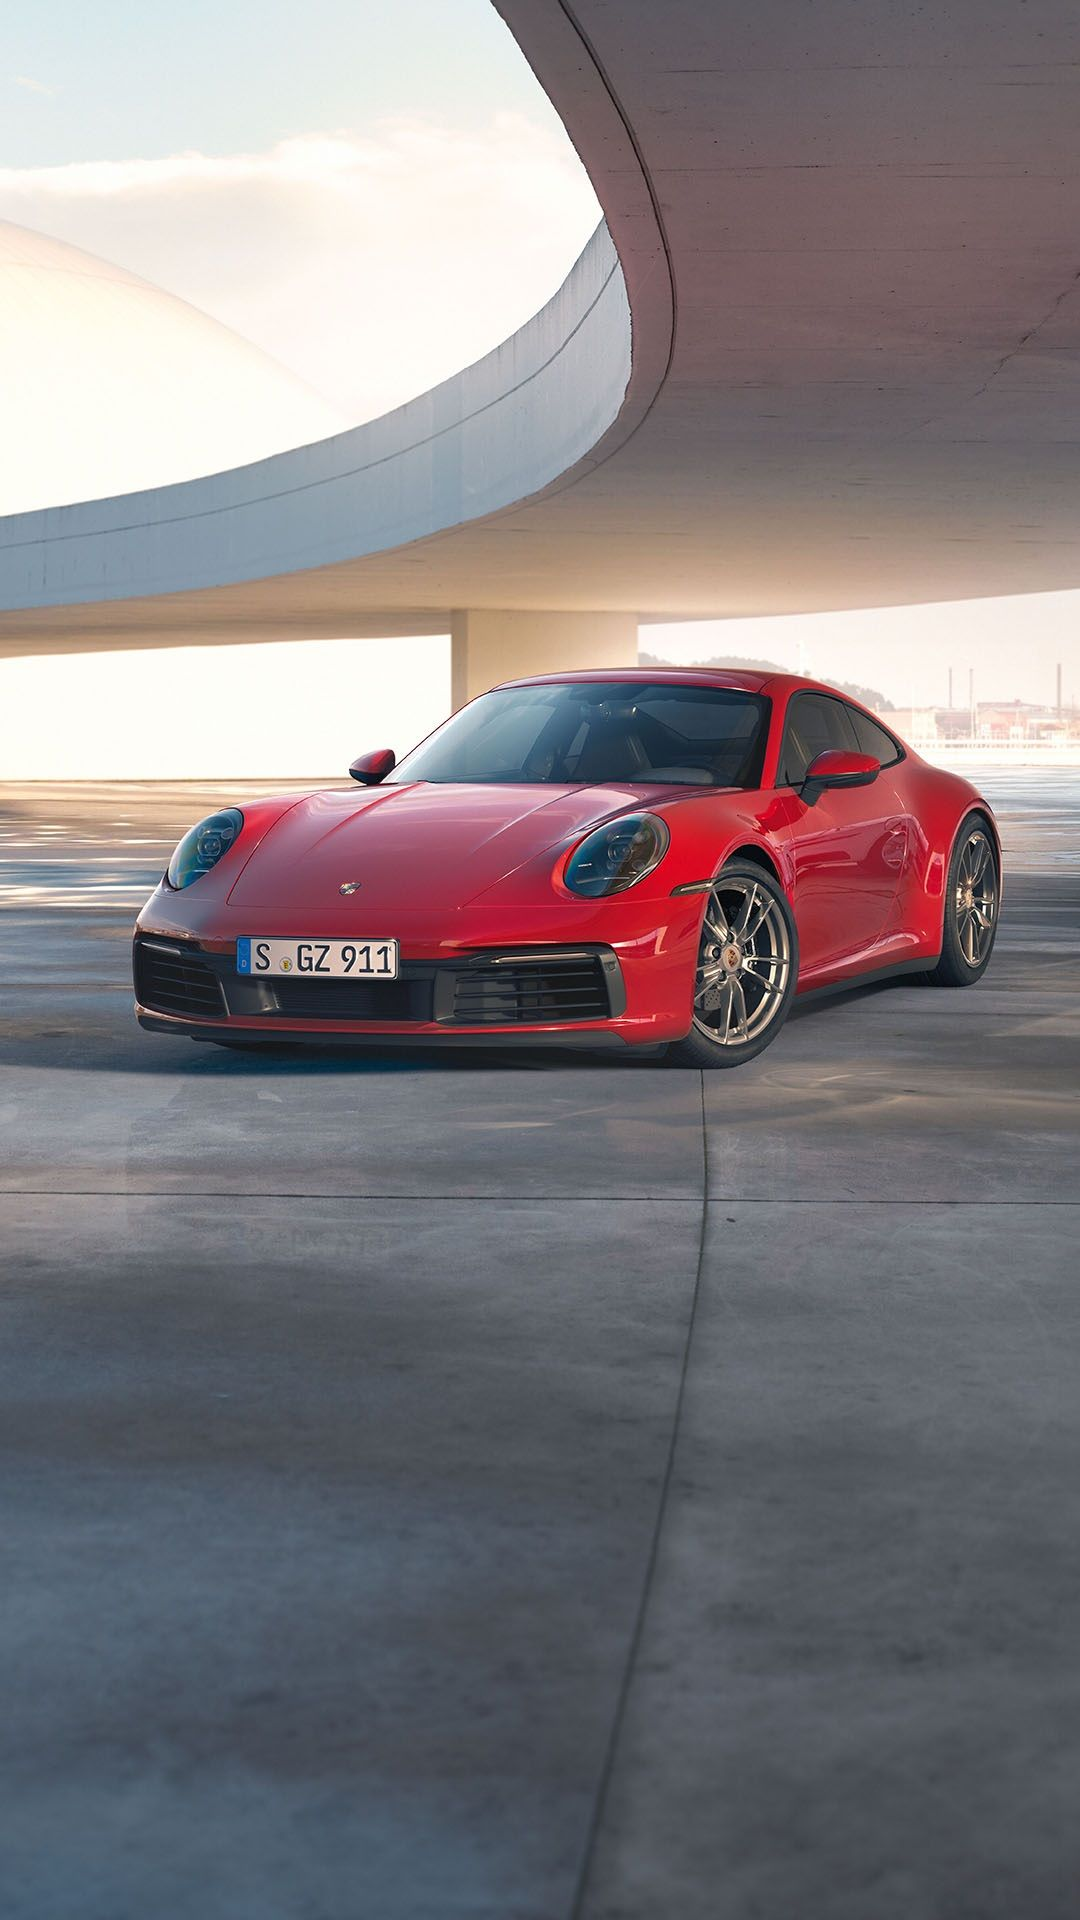 Porsche 911 Iphone Wallpapers Top Free Porsche 911 Iphone Backgrounds Wallpaperaccess